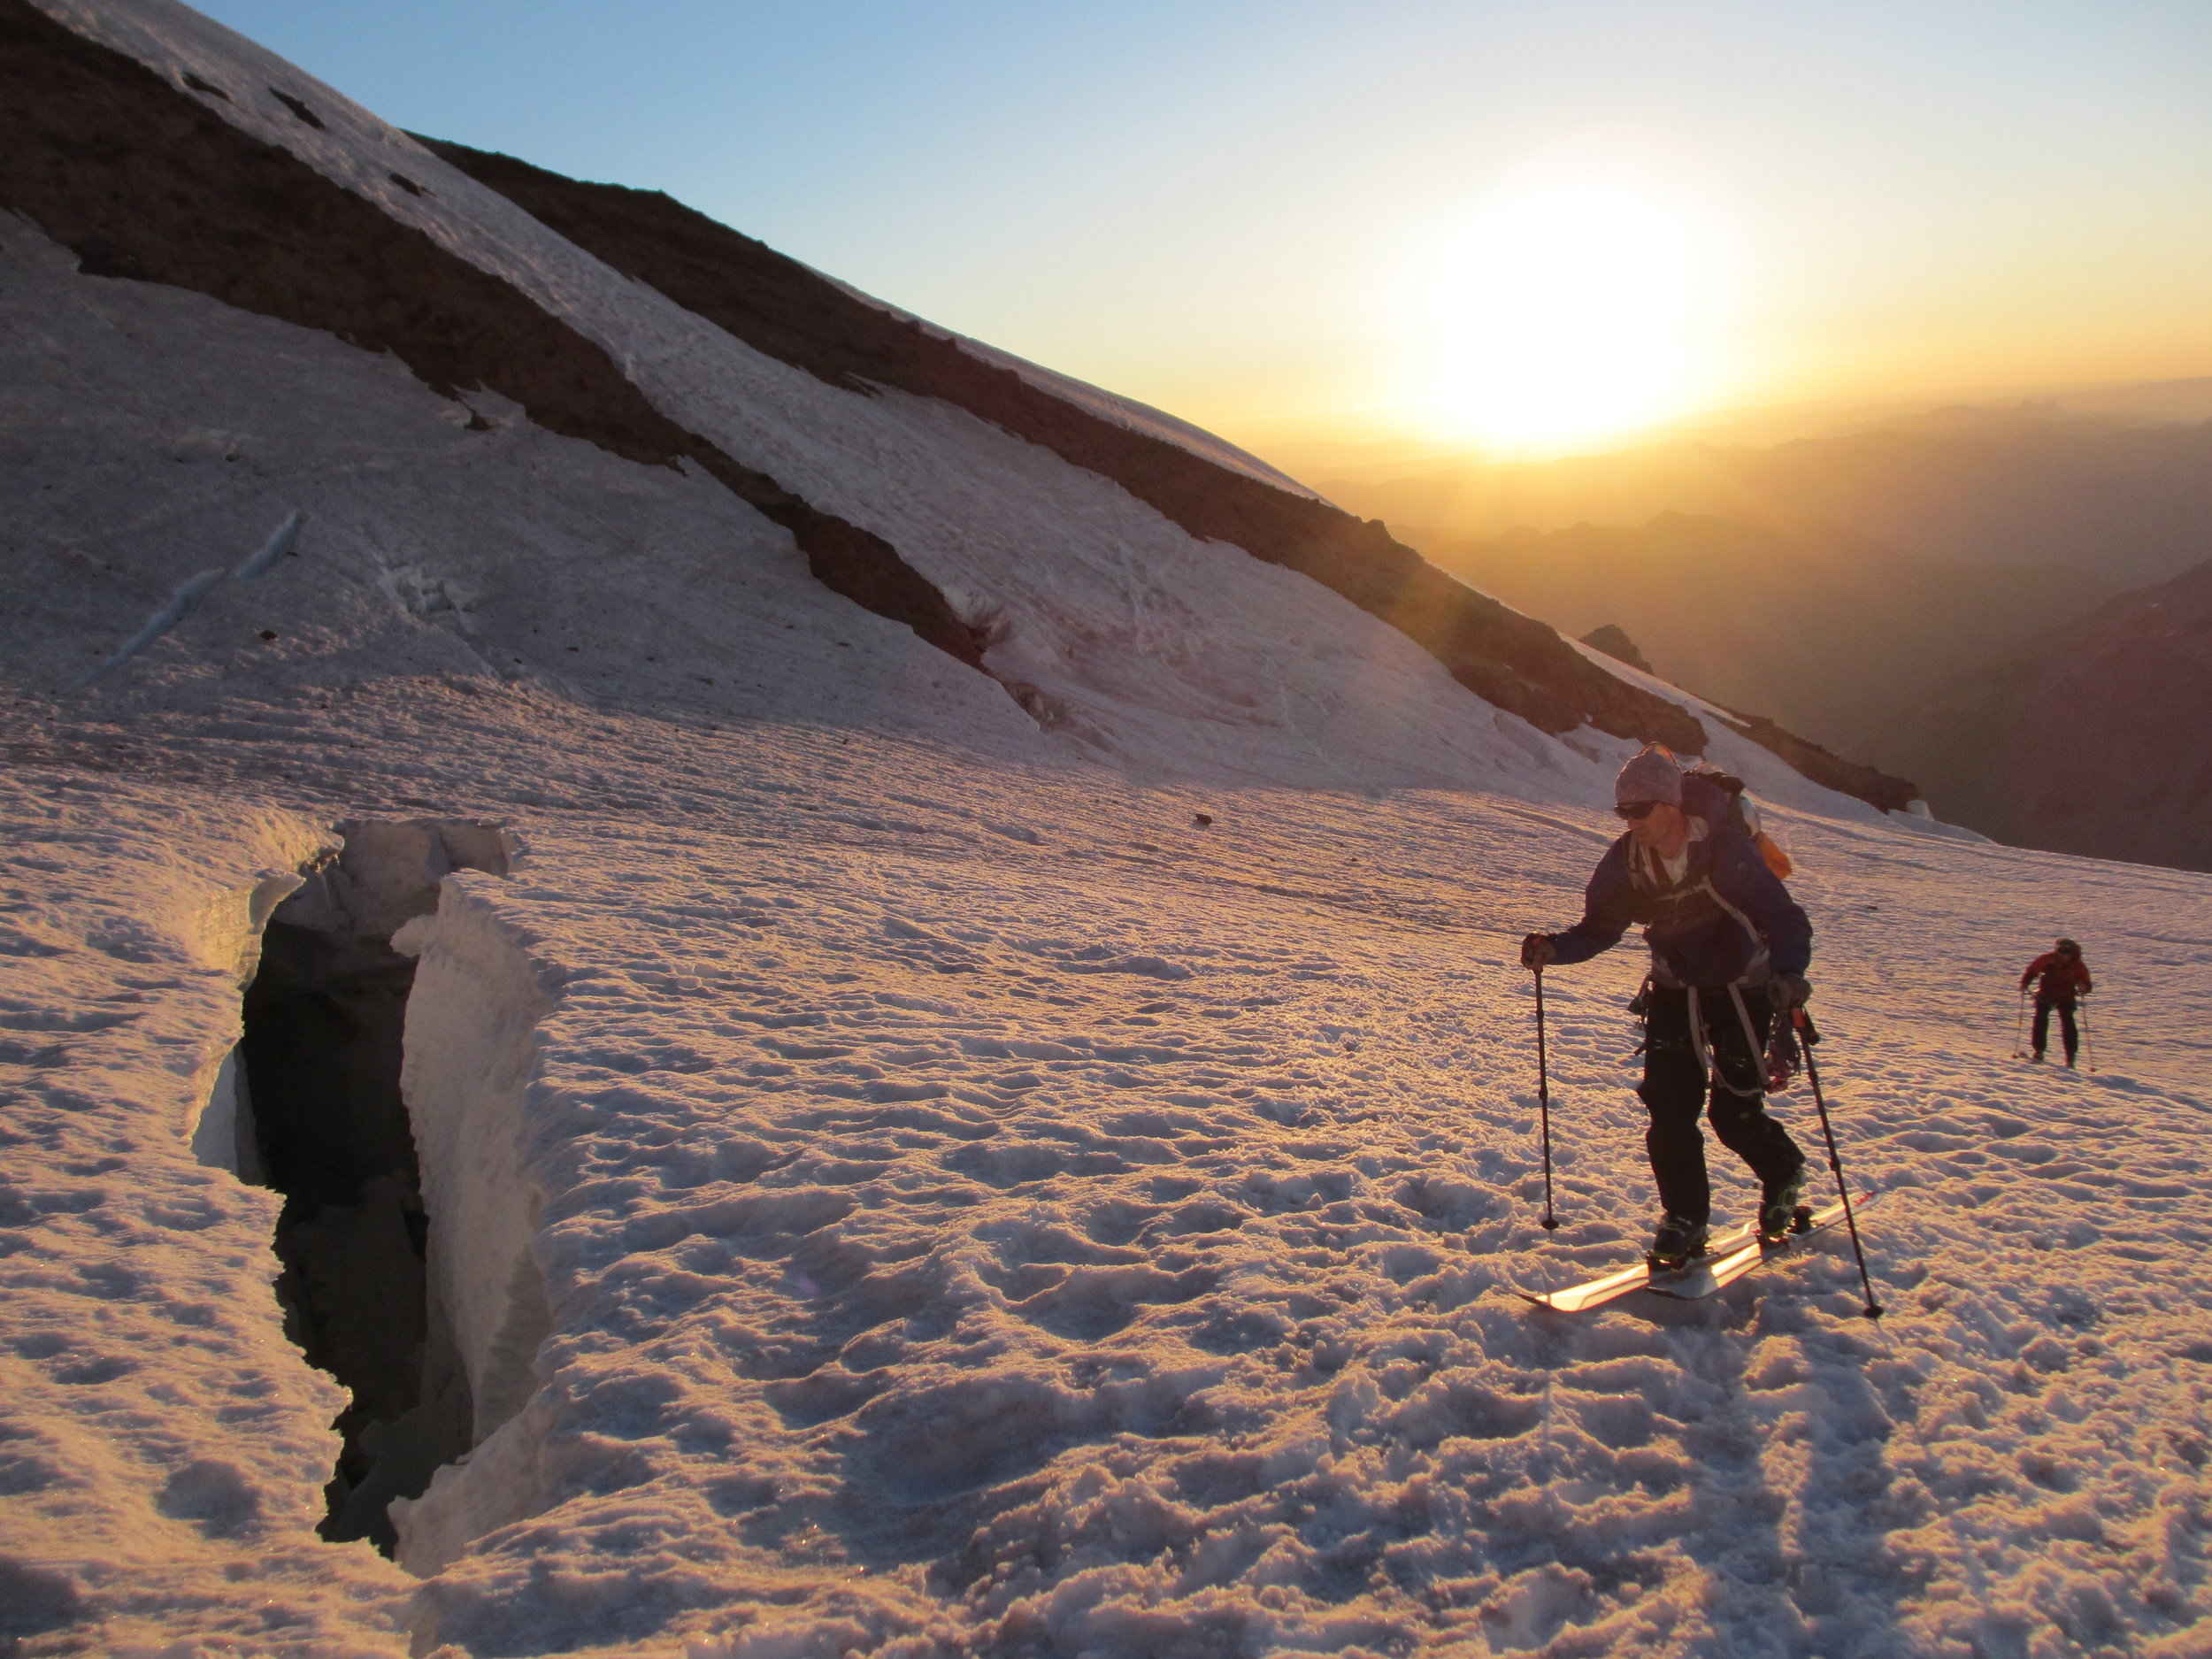 Crevasse Rescue/Glacier Travel -